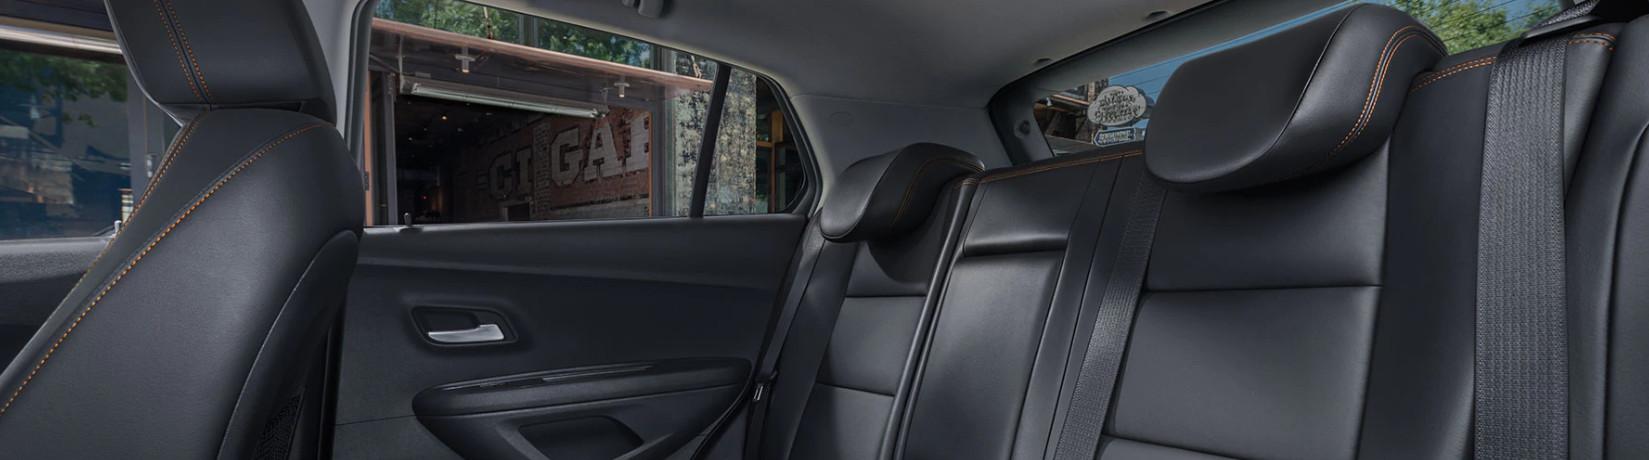 2020 Trax Leather Interior